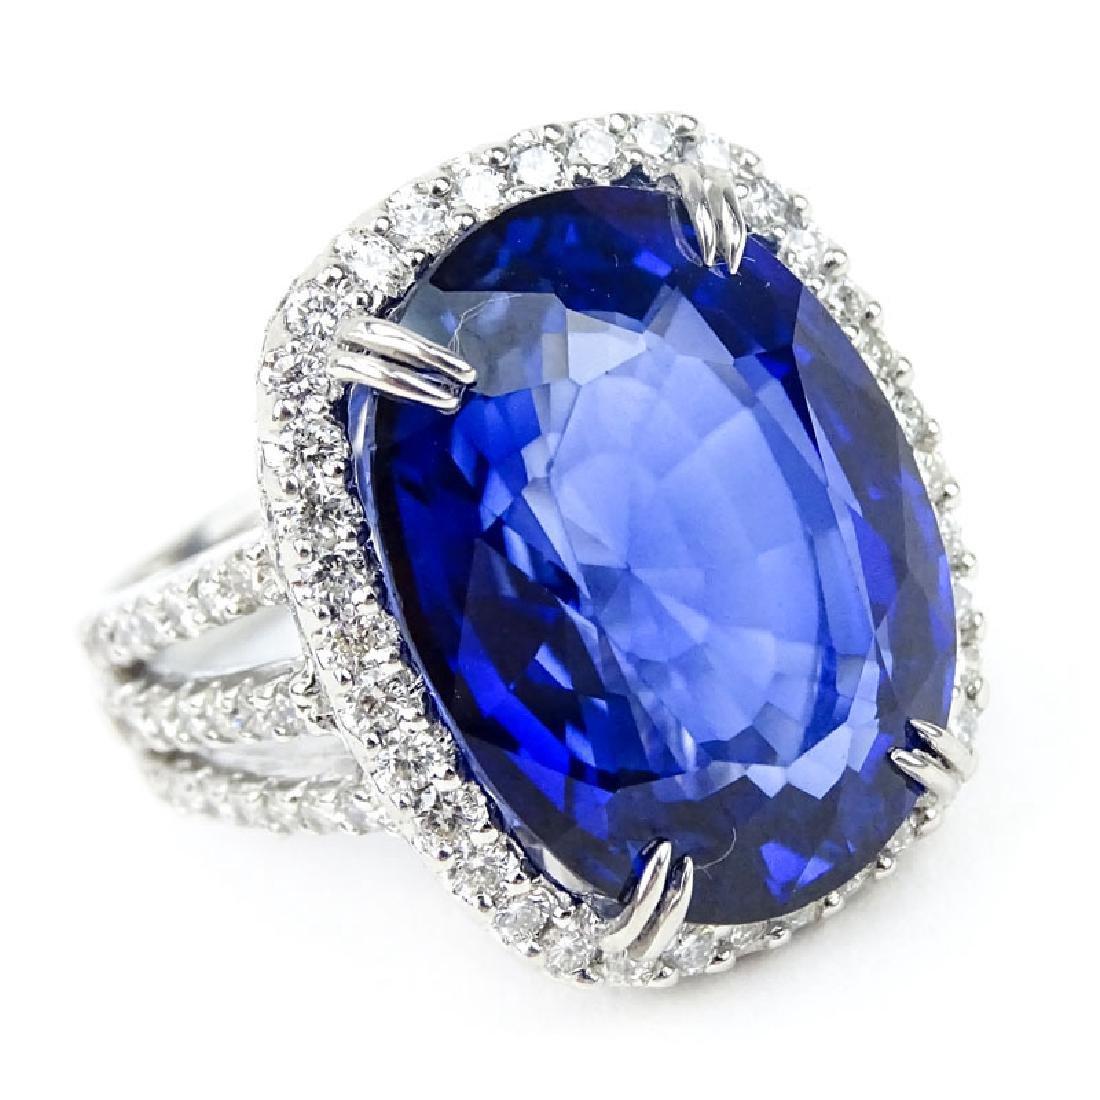 24.14 Carat Oval Cut Royal Blue Sapphire, 2.08 Carat